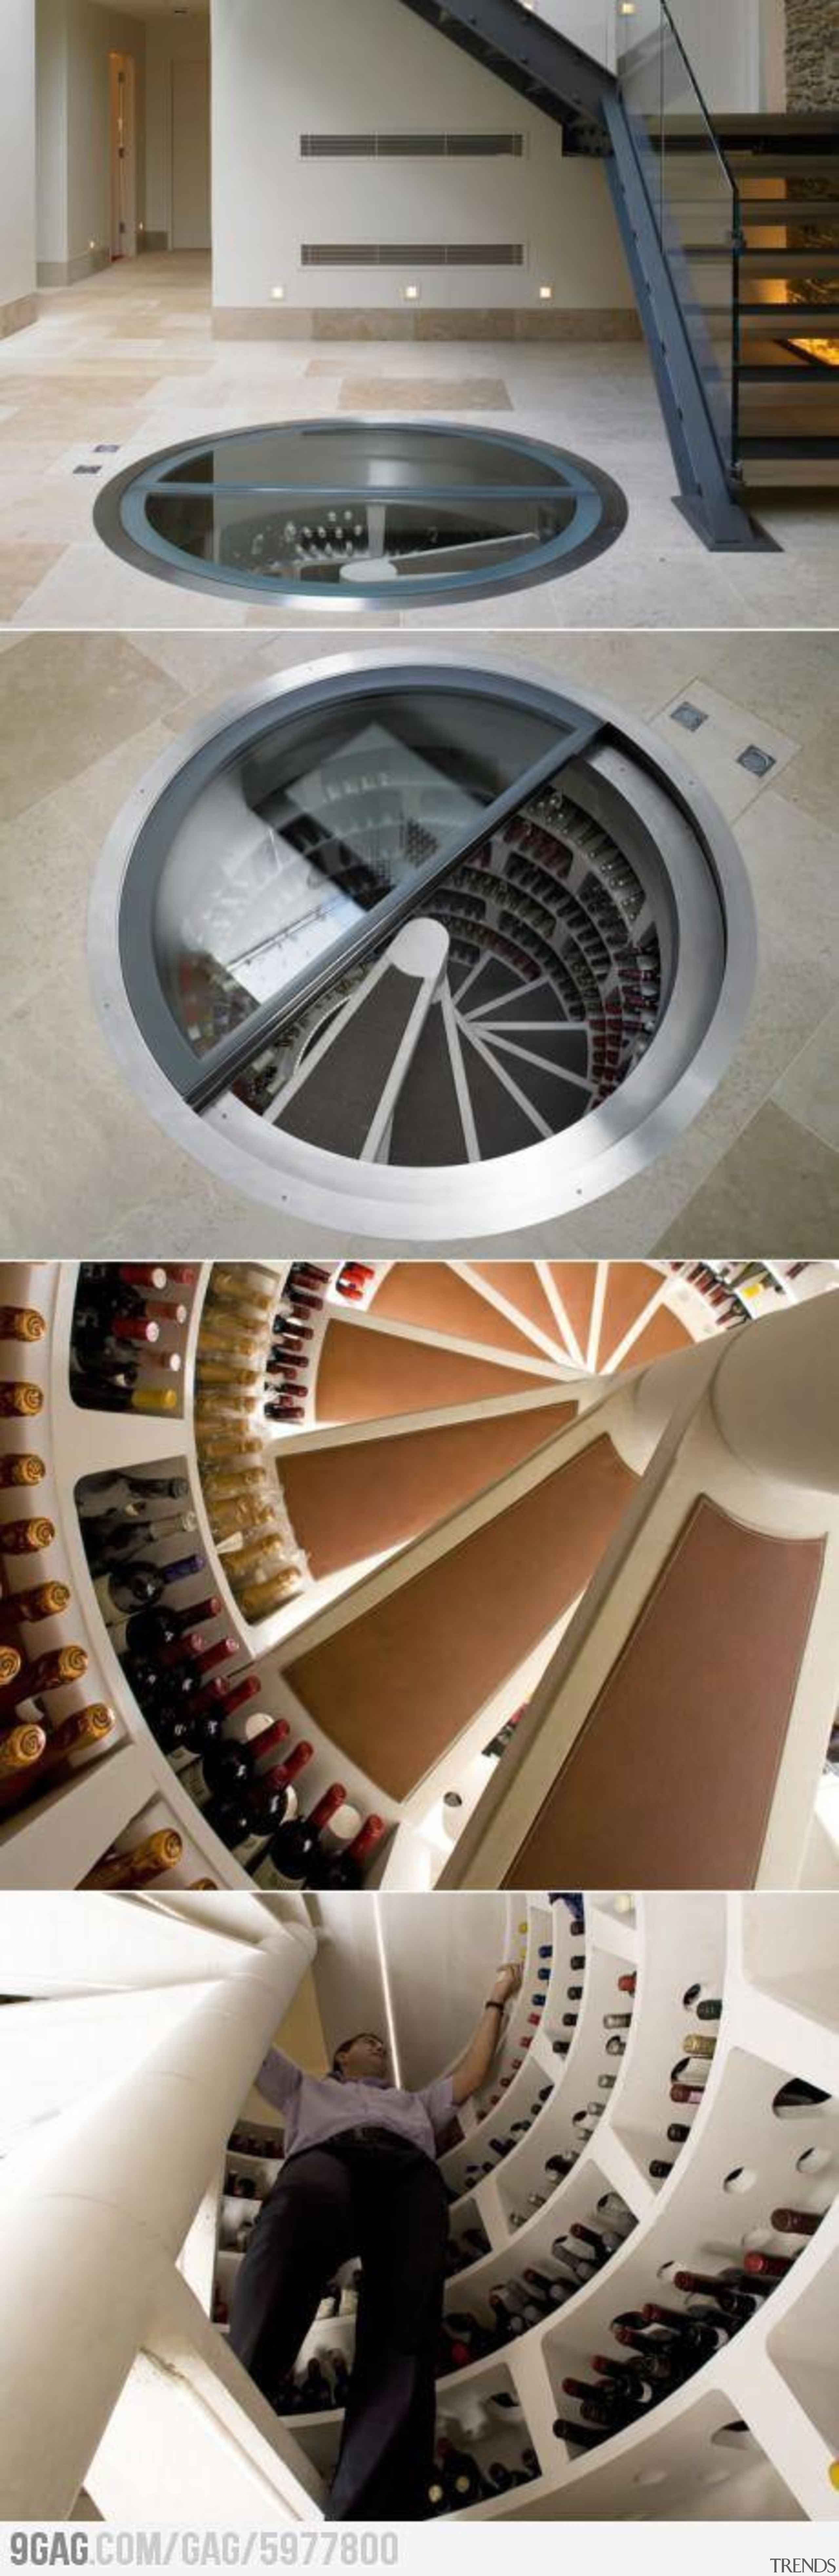 Modern Wine Cellar Ideas - Modern Wine Cellar product design, wheel, gray